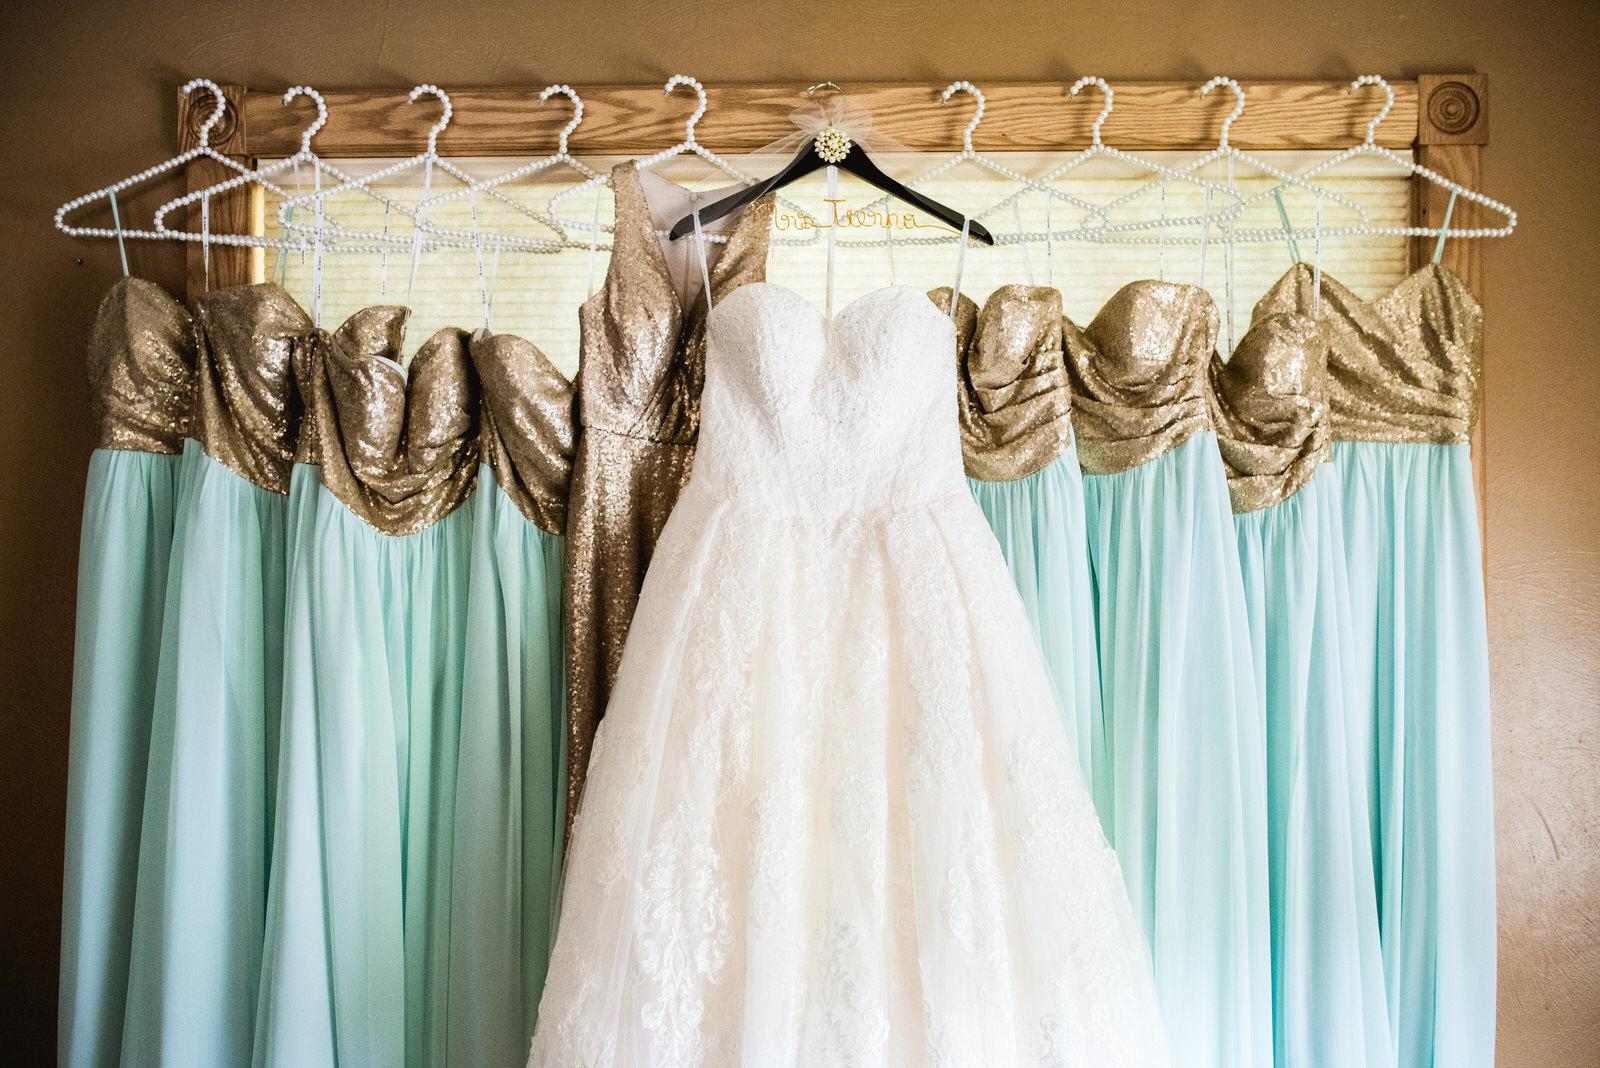 Laube_Banquet_Hall__Wedding_Photos_025.jpg